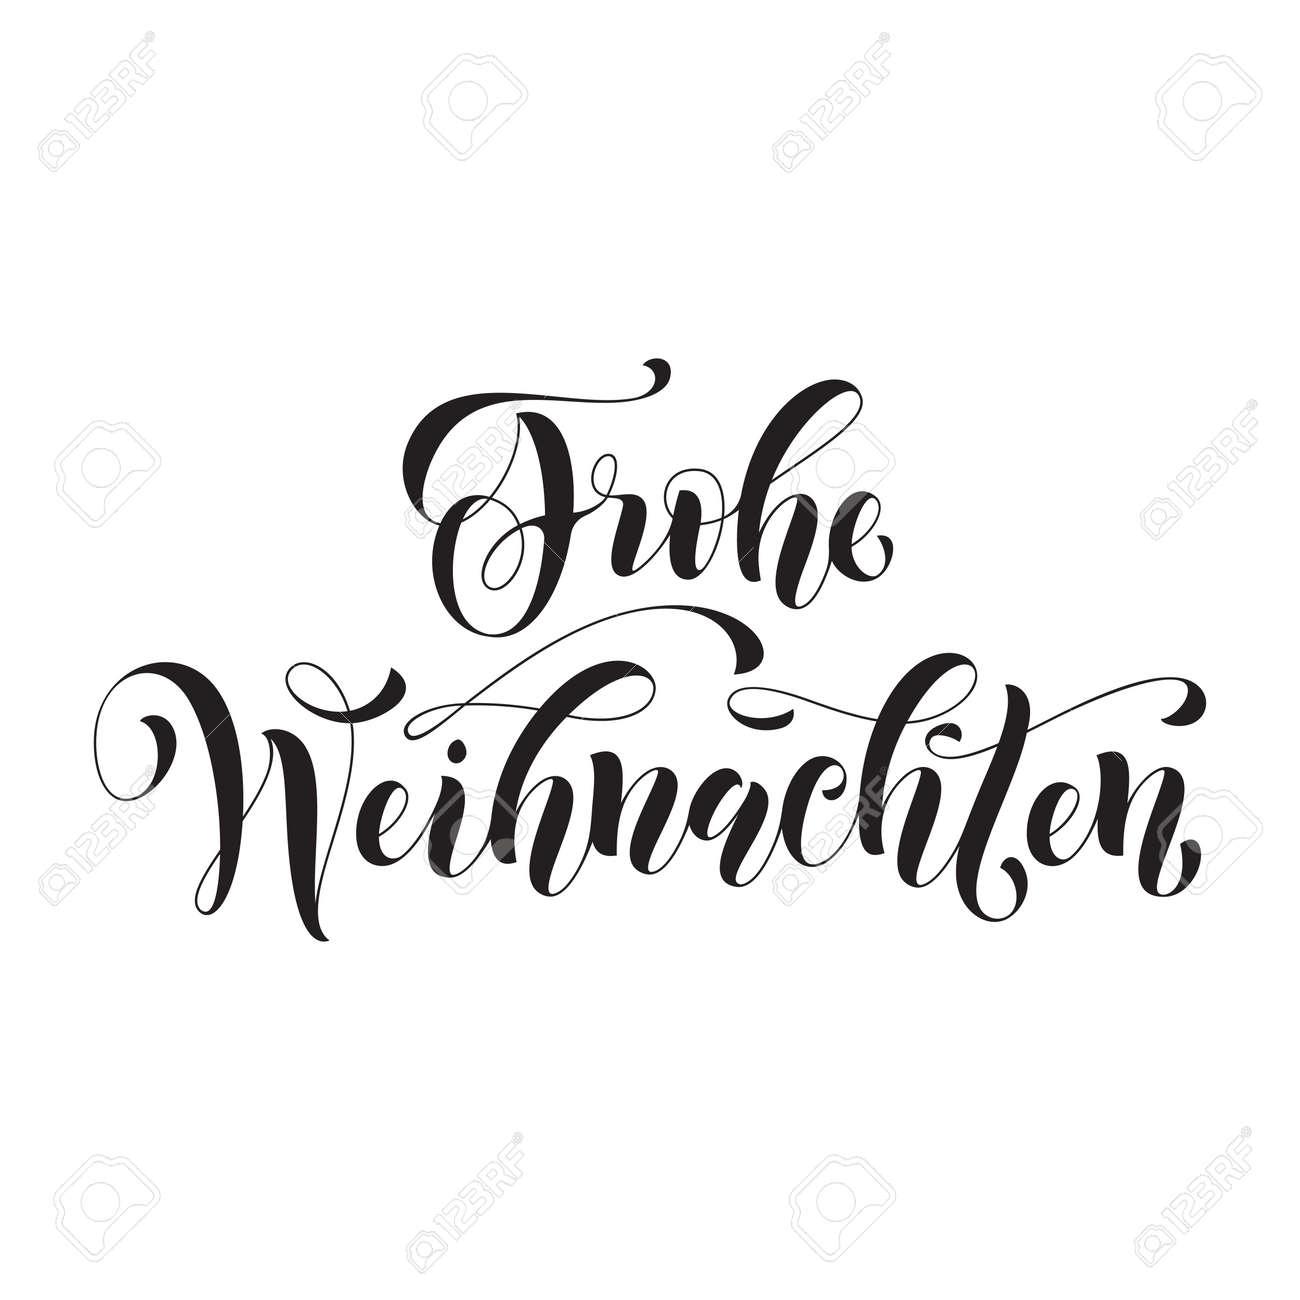 Text Frohe Weihnachten.Frohe Weihnachten German Christmas Greeting Card Vector Hand